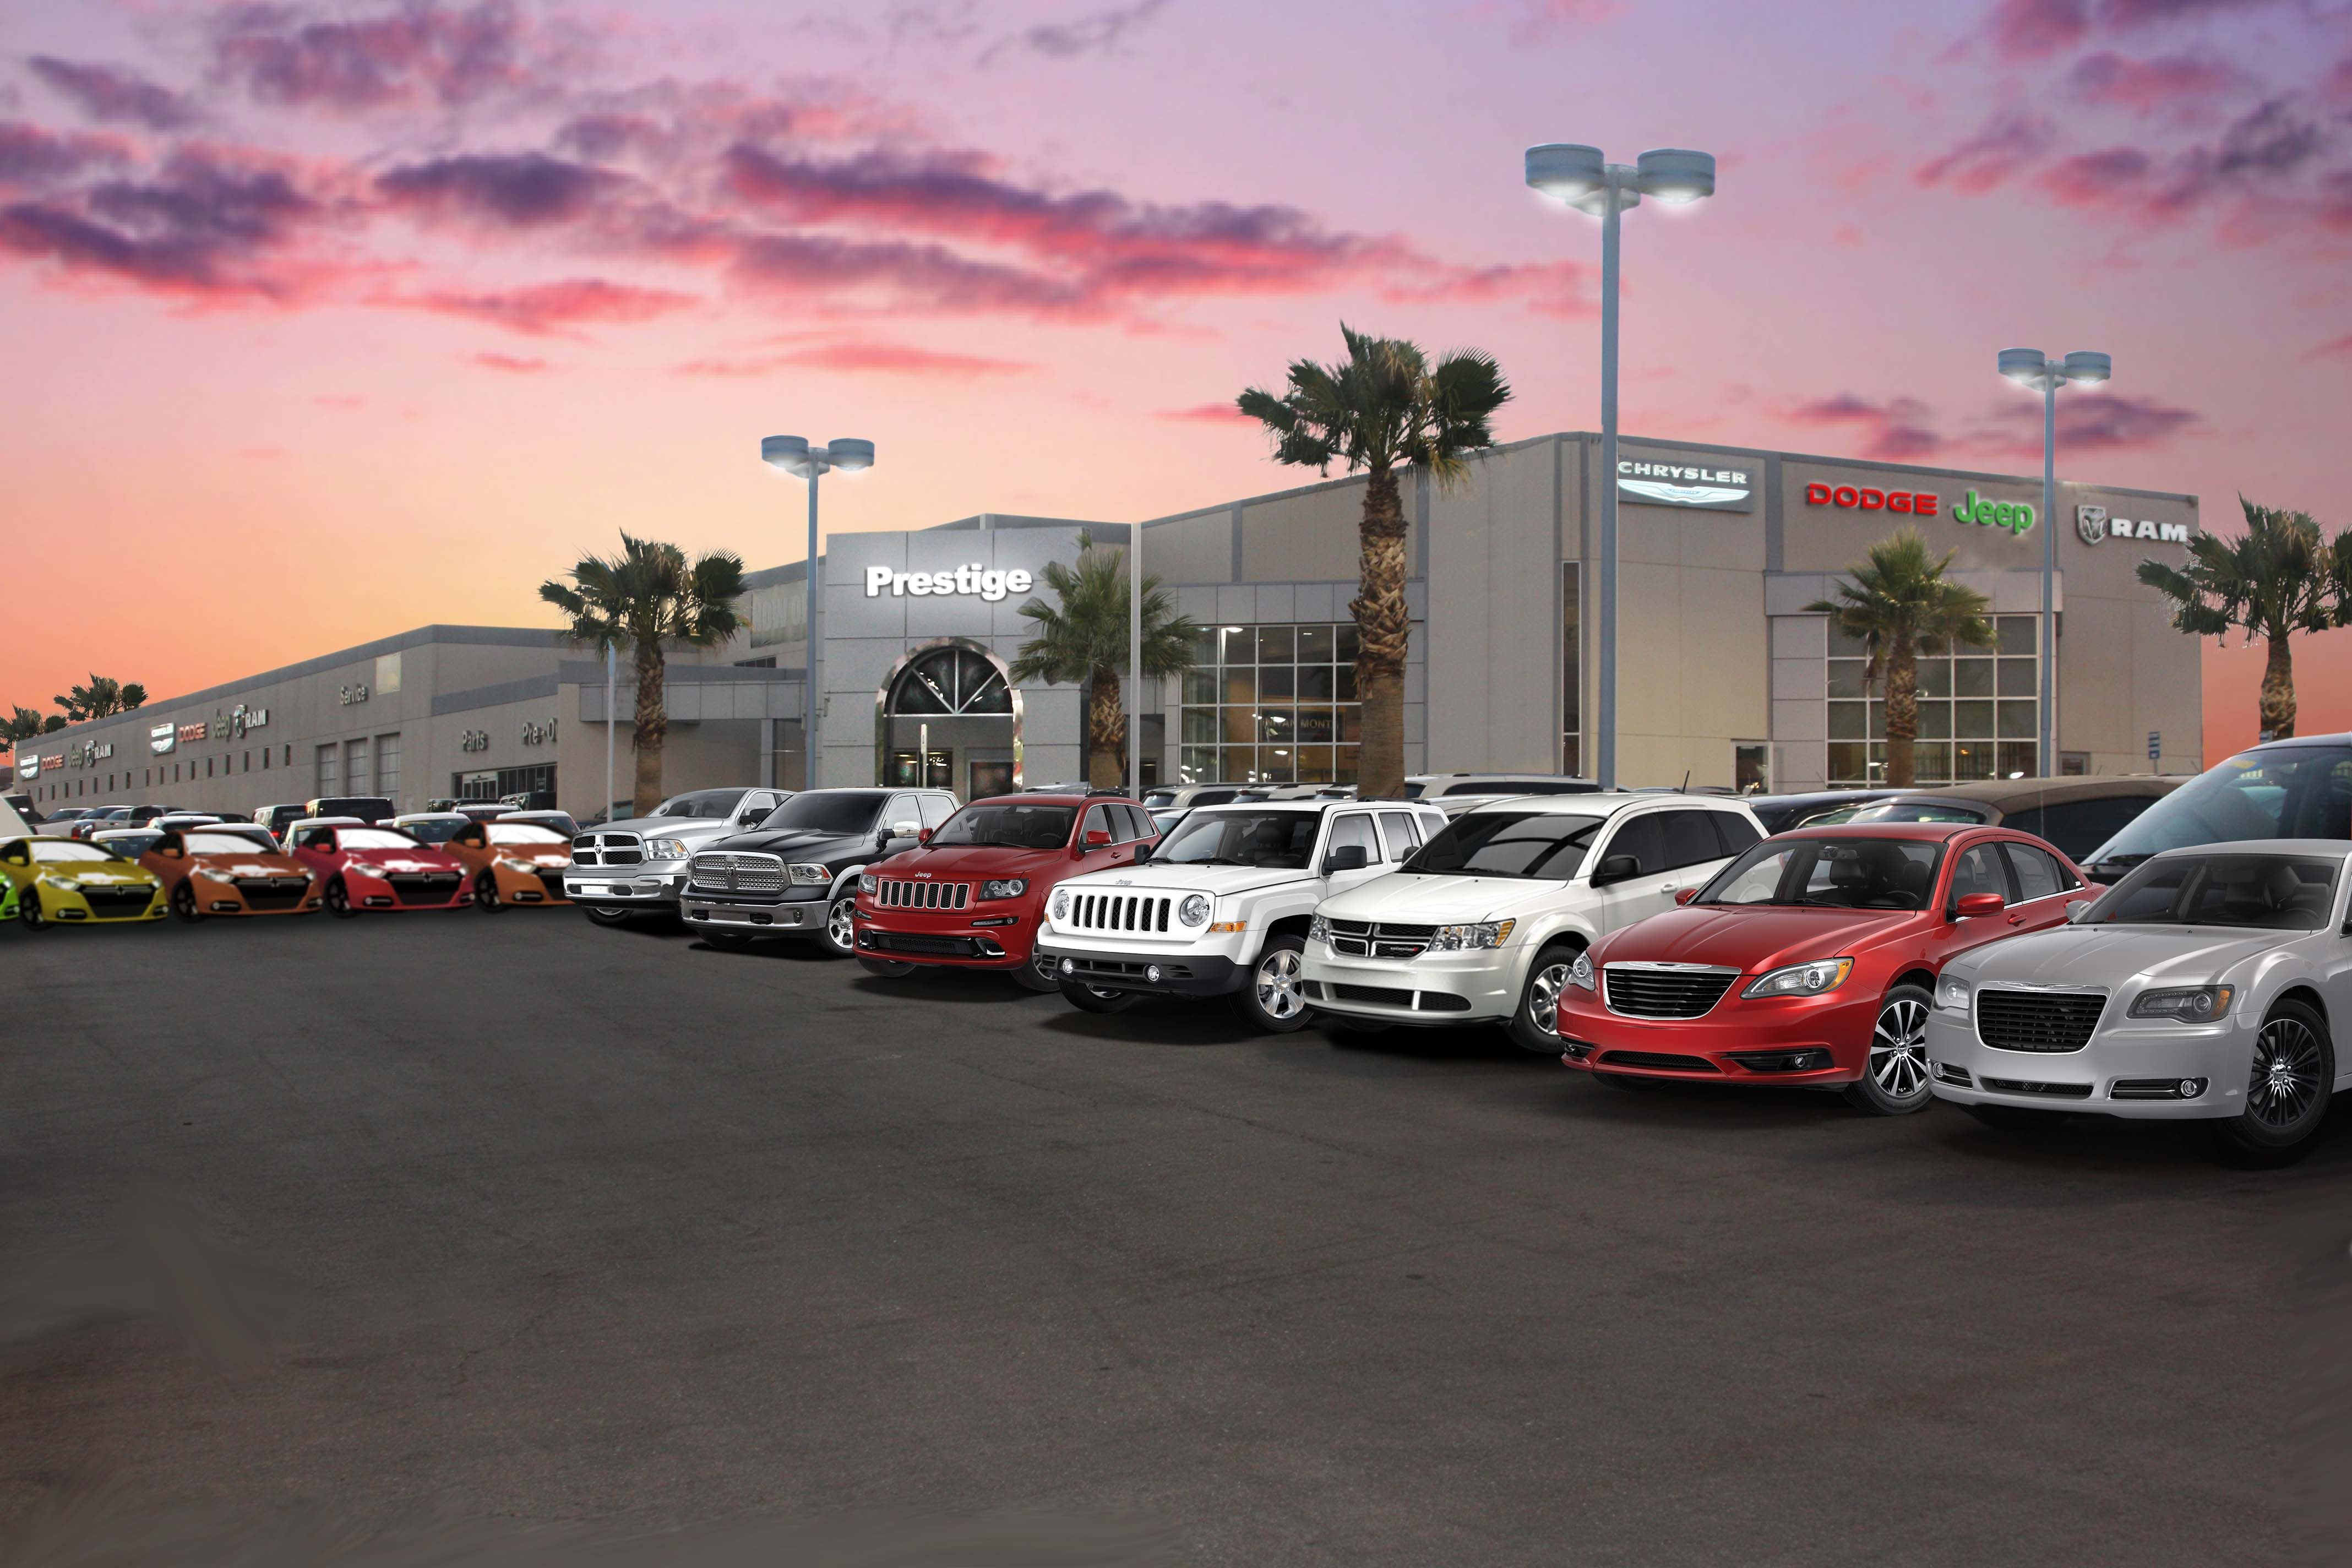 middlesboro dealership htm dodge about chrysler in kentucky ram short tim jeep